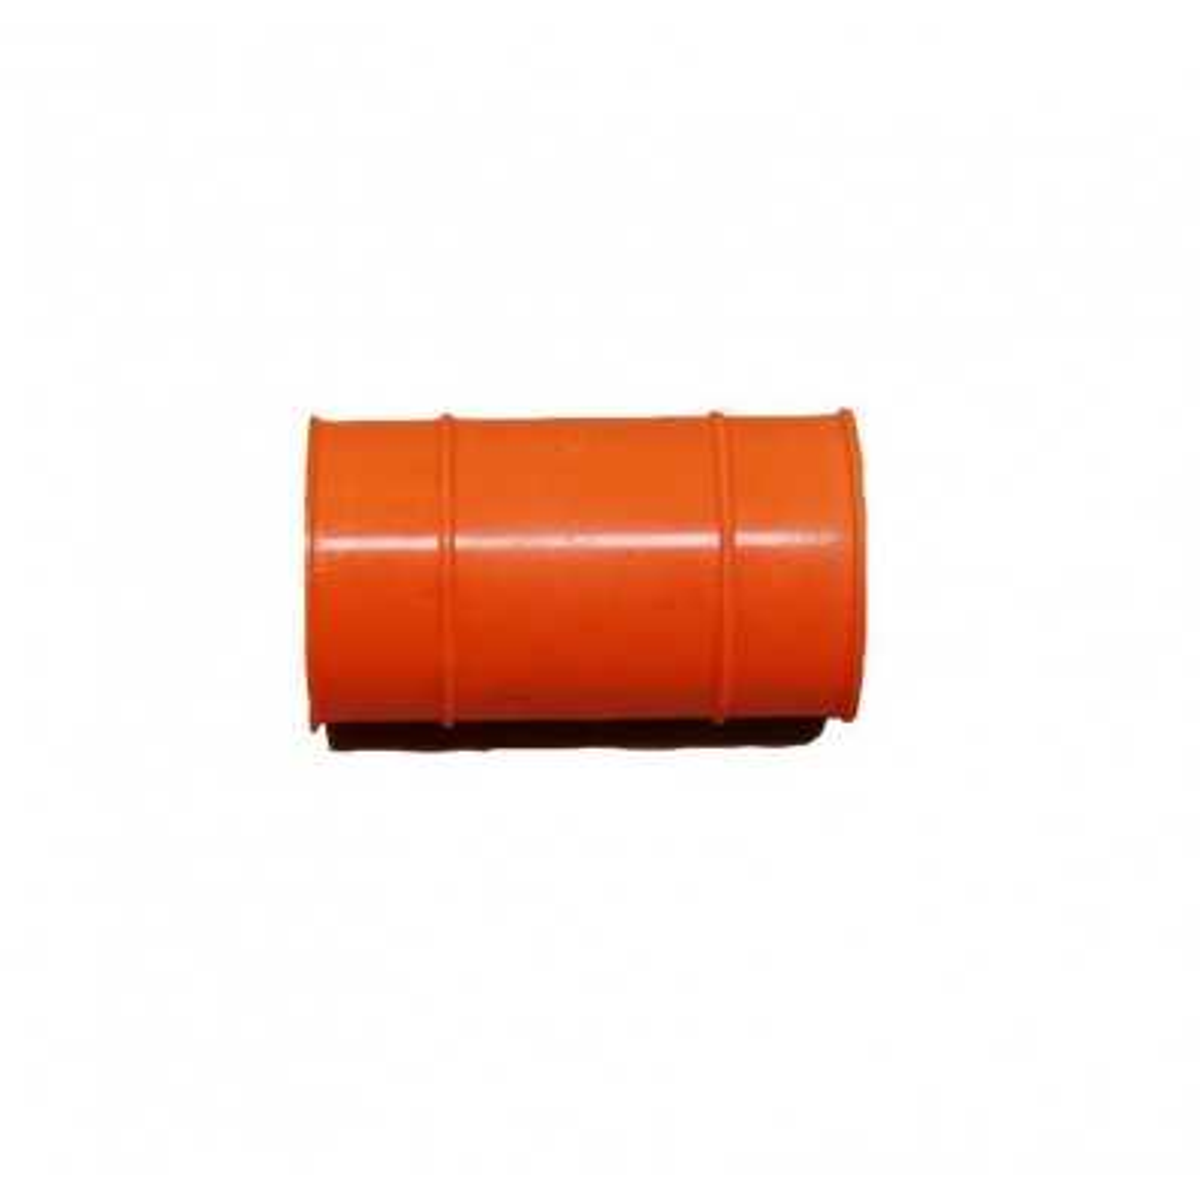 4MX480210-NR - Goma Ujnion Escape 4Mx 125 200Cc Naranja